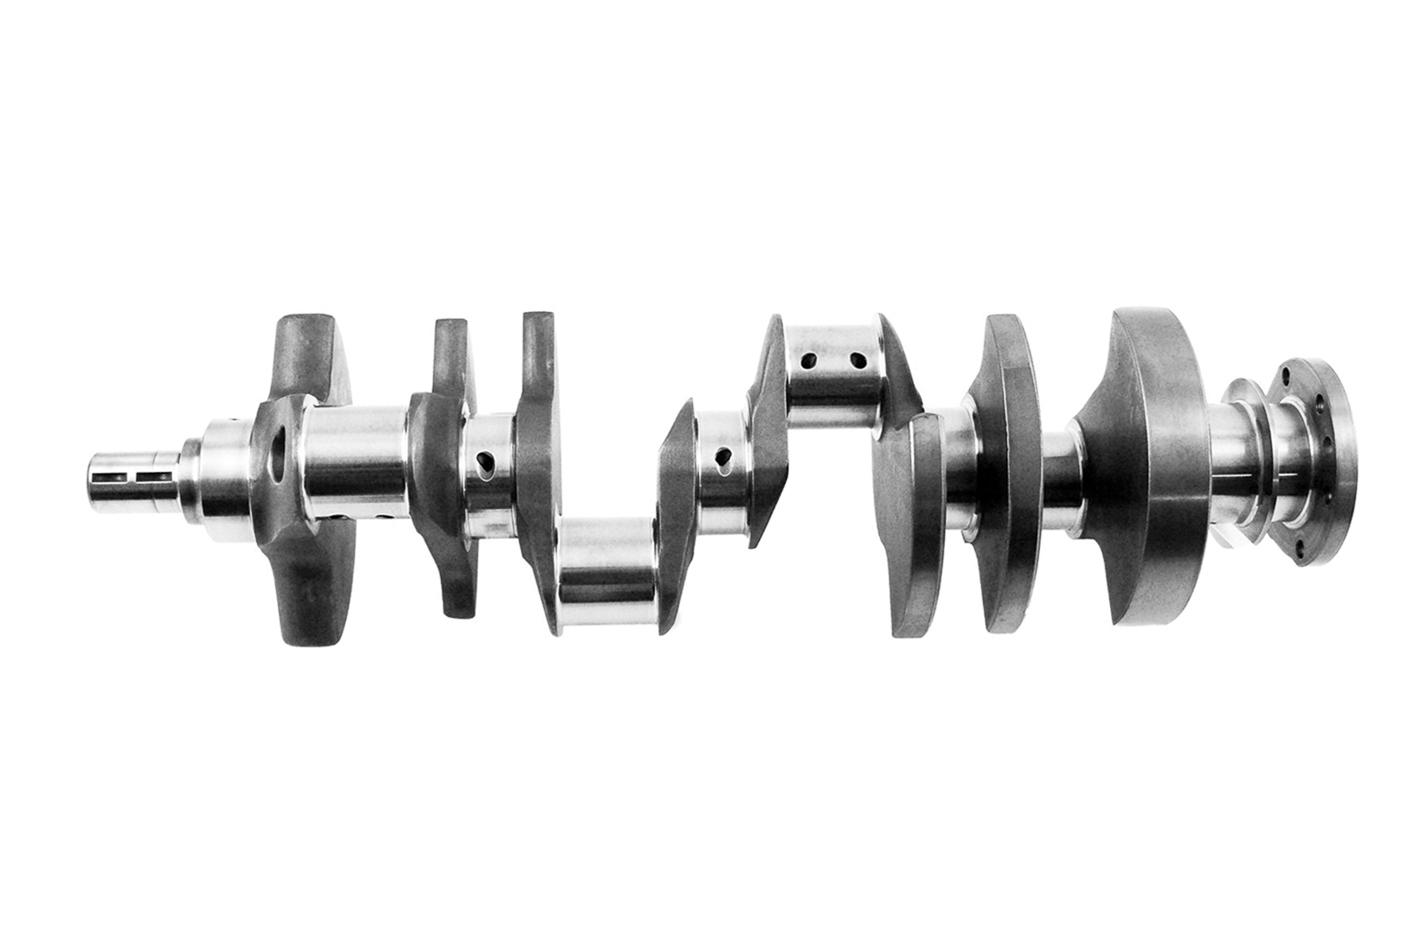 Scat Enterprises SBC 4340 Forged Crank - 3.750 Stroke